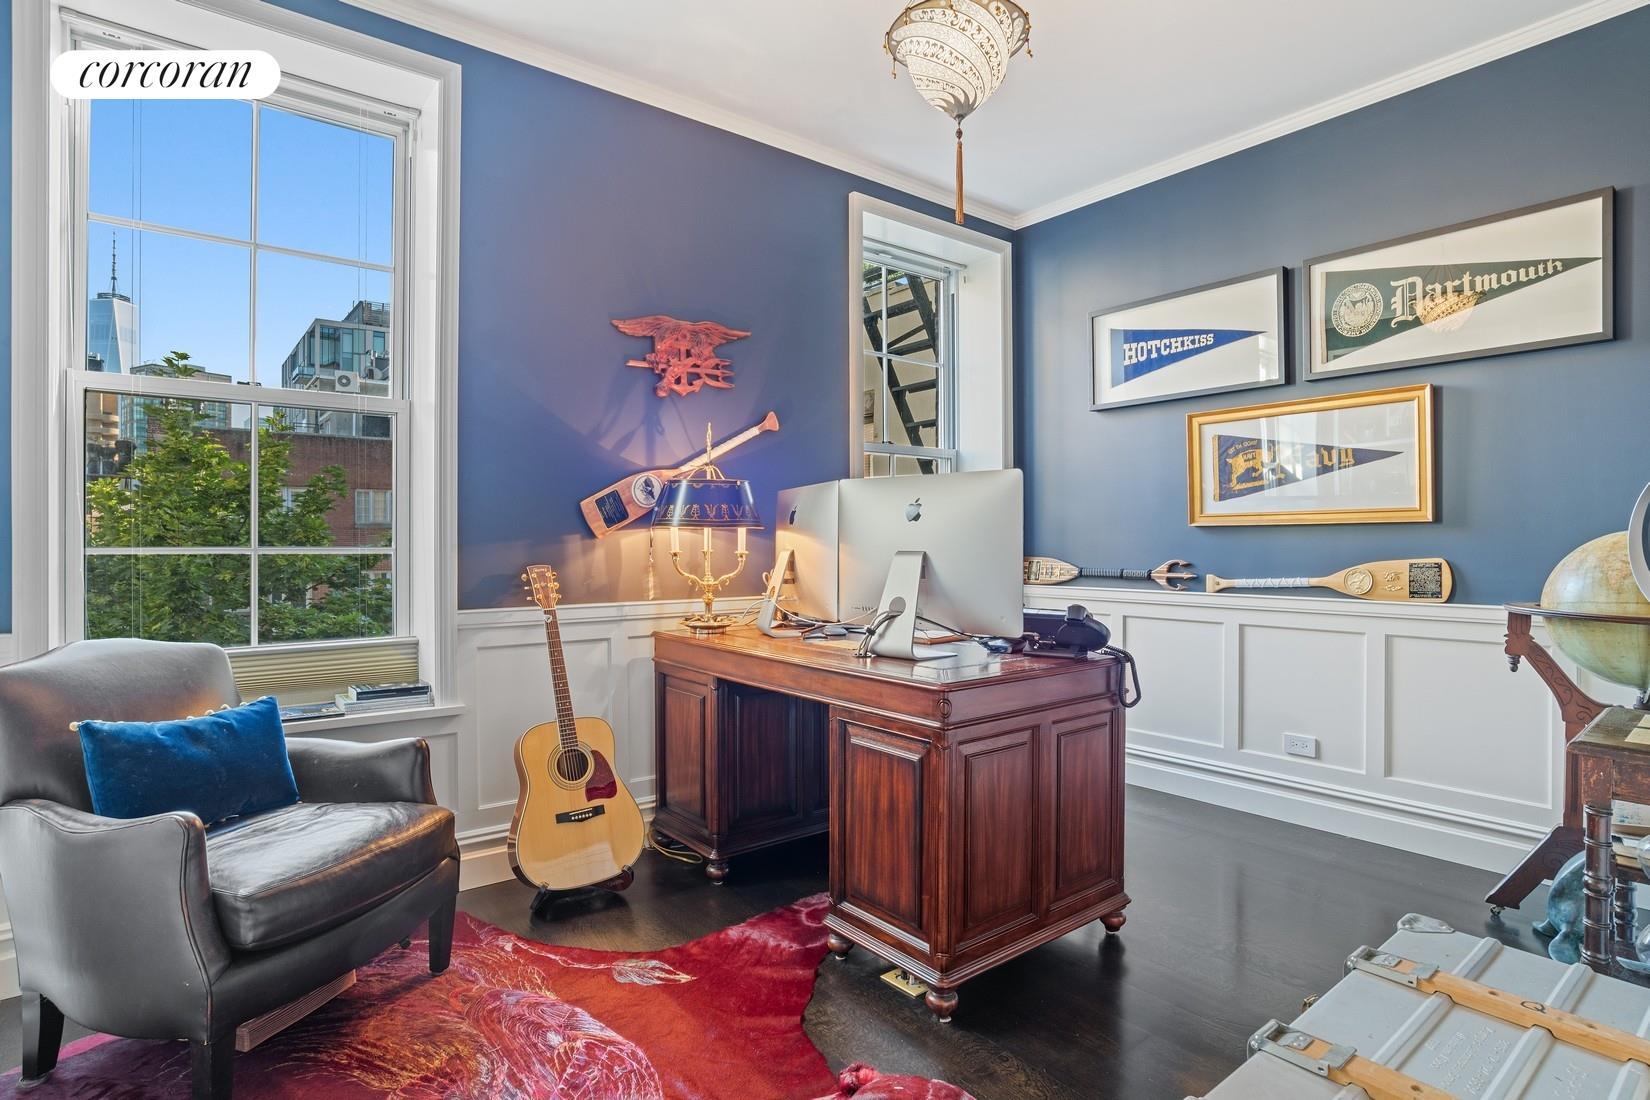 Apartment for sale at 140 Sullivan Street, Apt 4/5